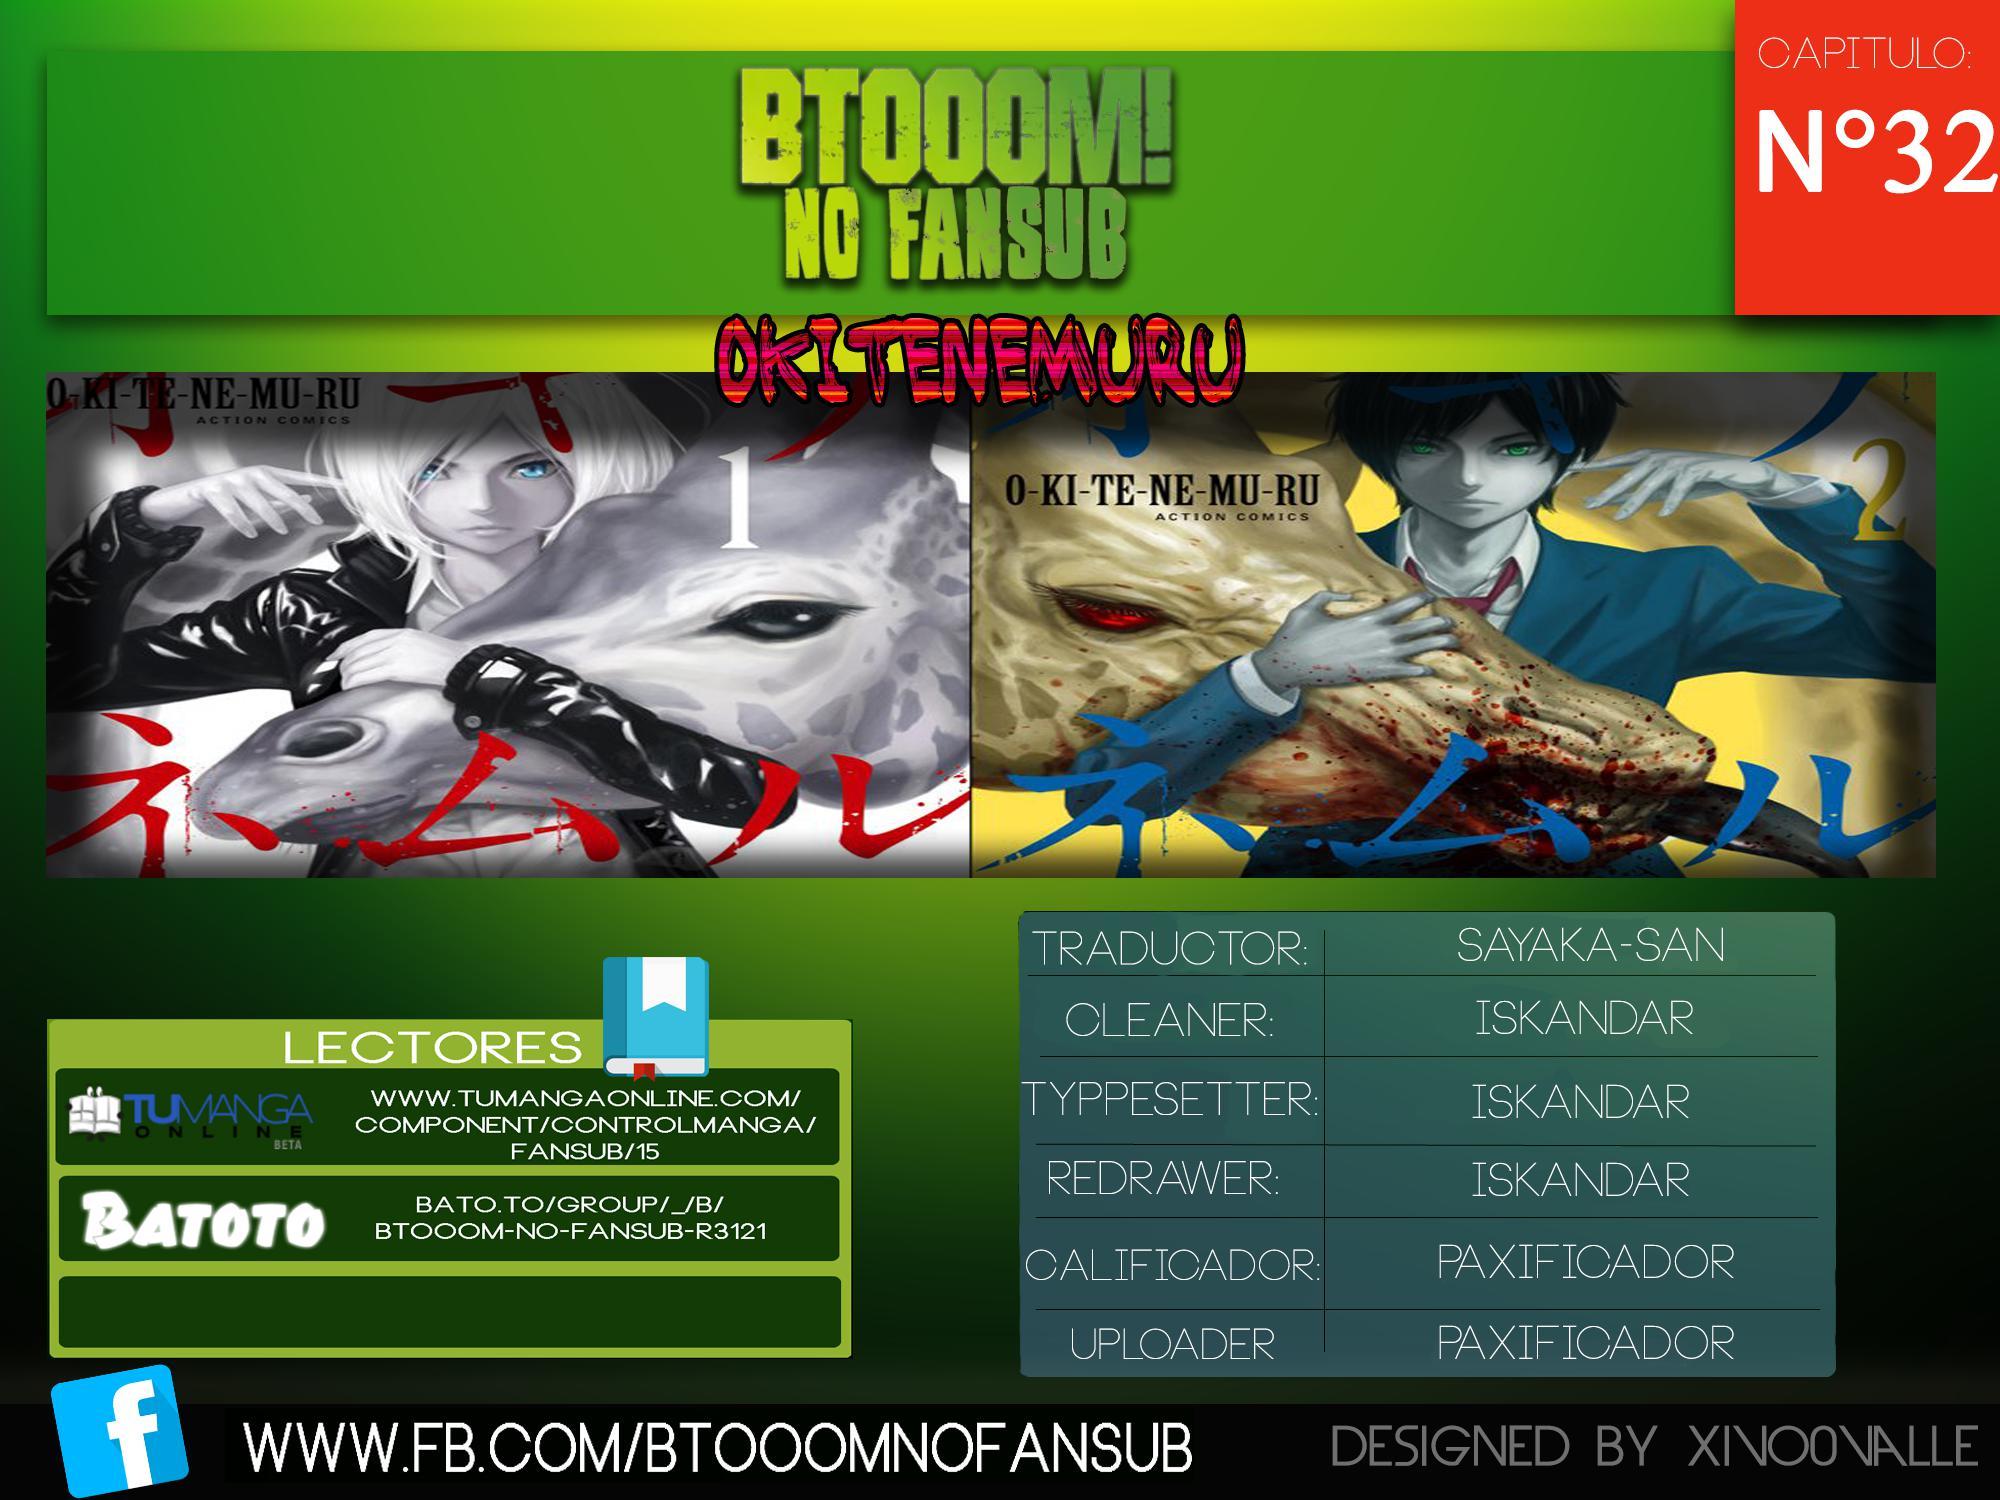 http://c5.ninemanga.com/es_manga/54/16310/423644/c3a08823c0a99a479fb4b94699c06e74.jpg Page 1